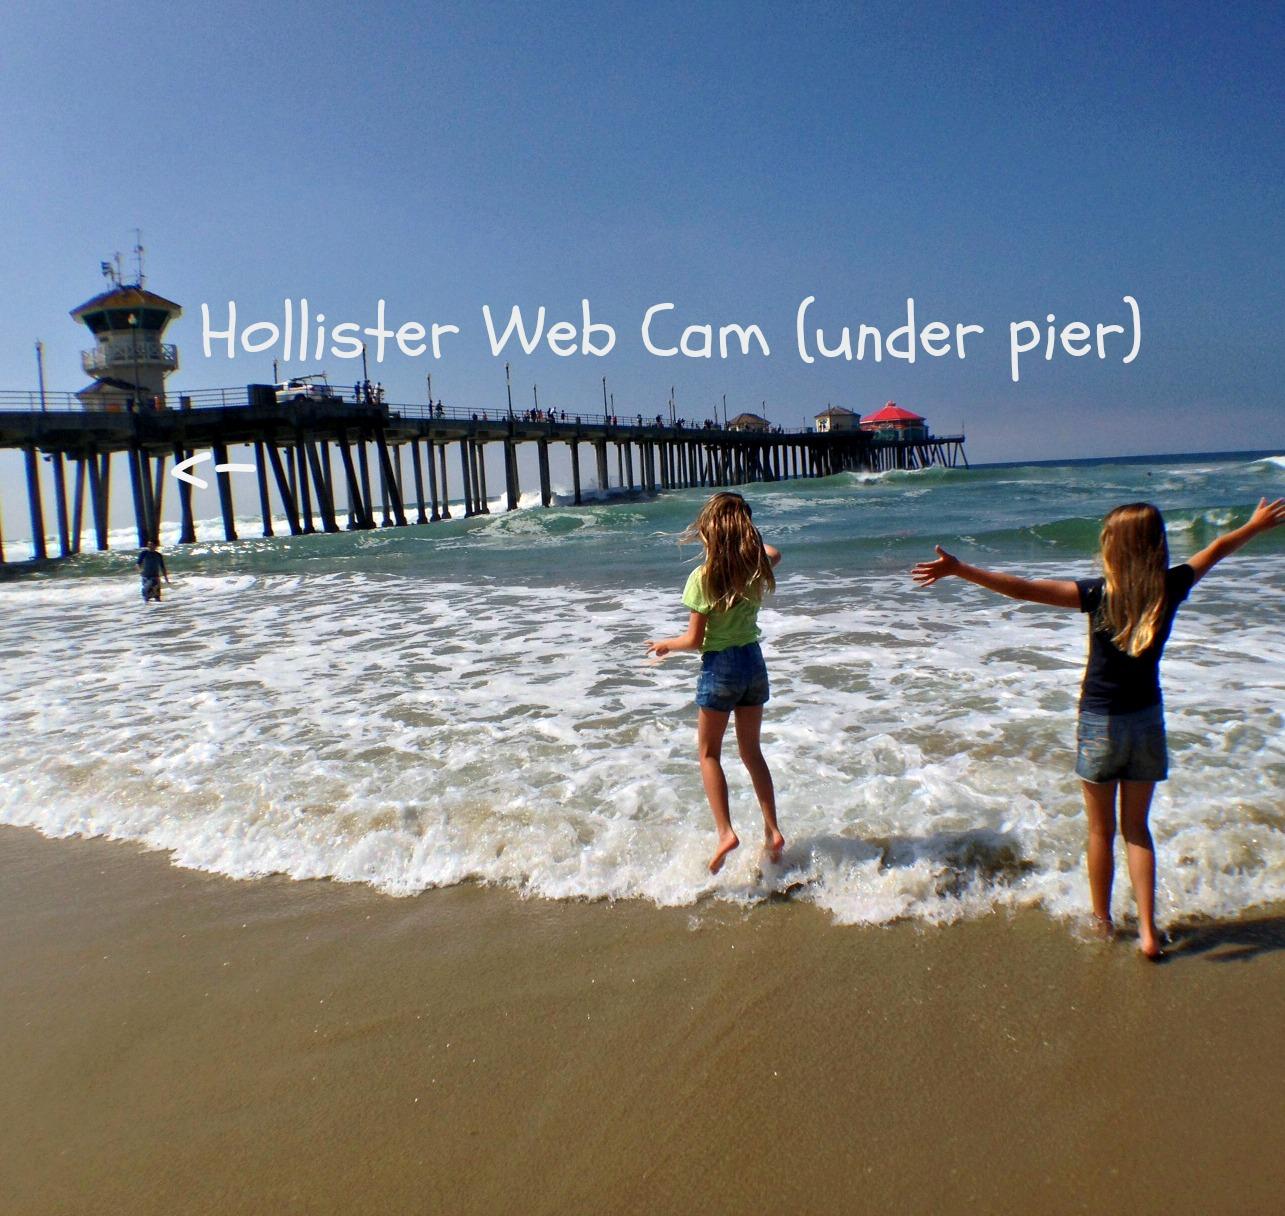 Huntington Beach Live Cam Surf